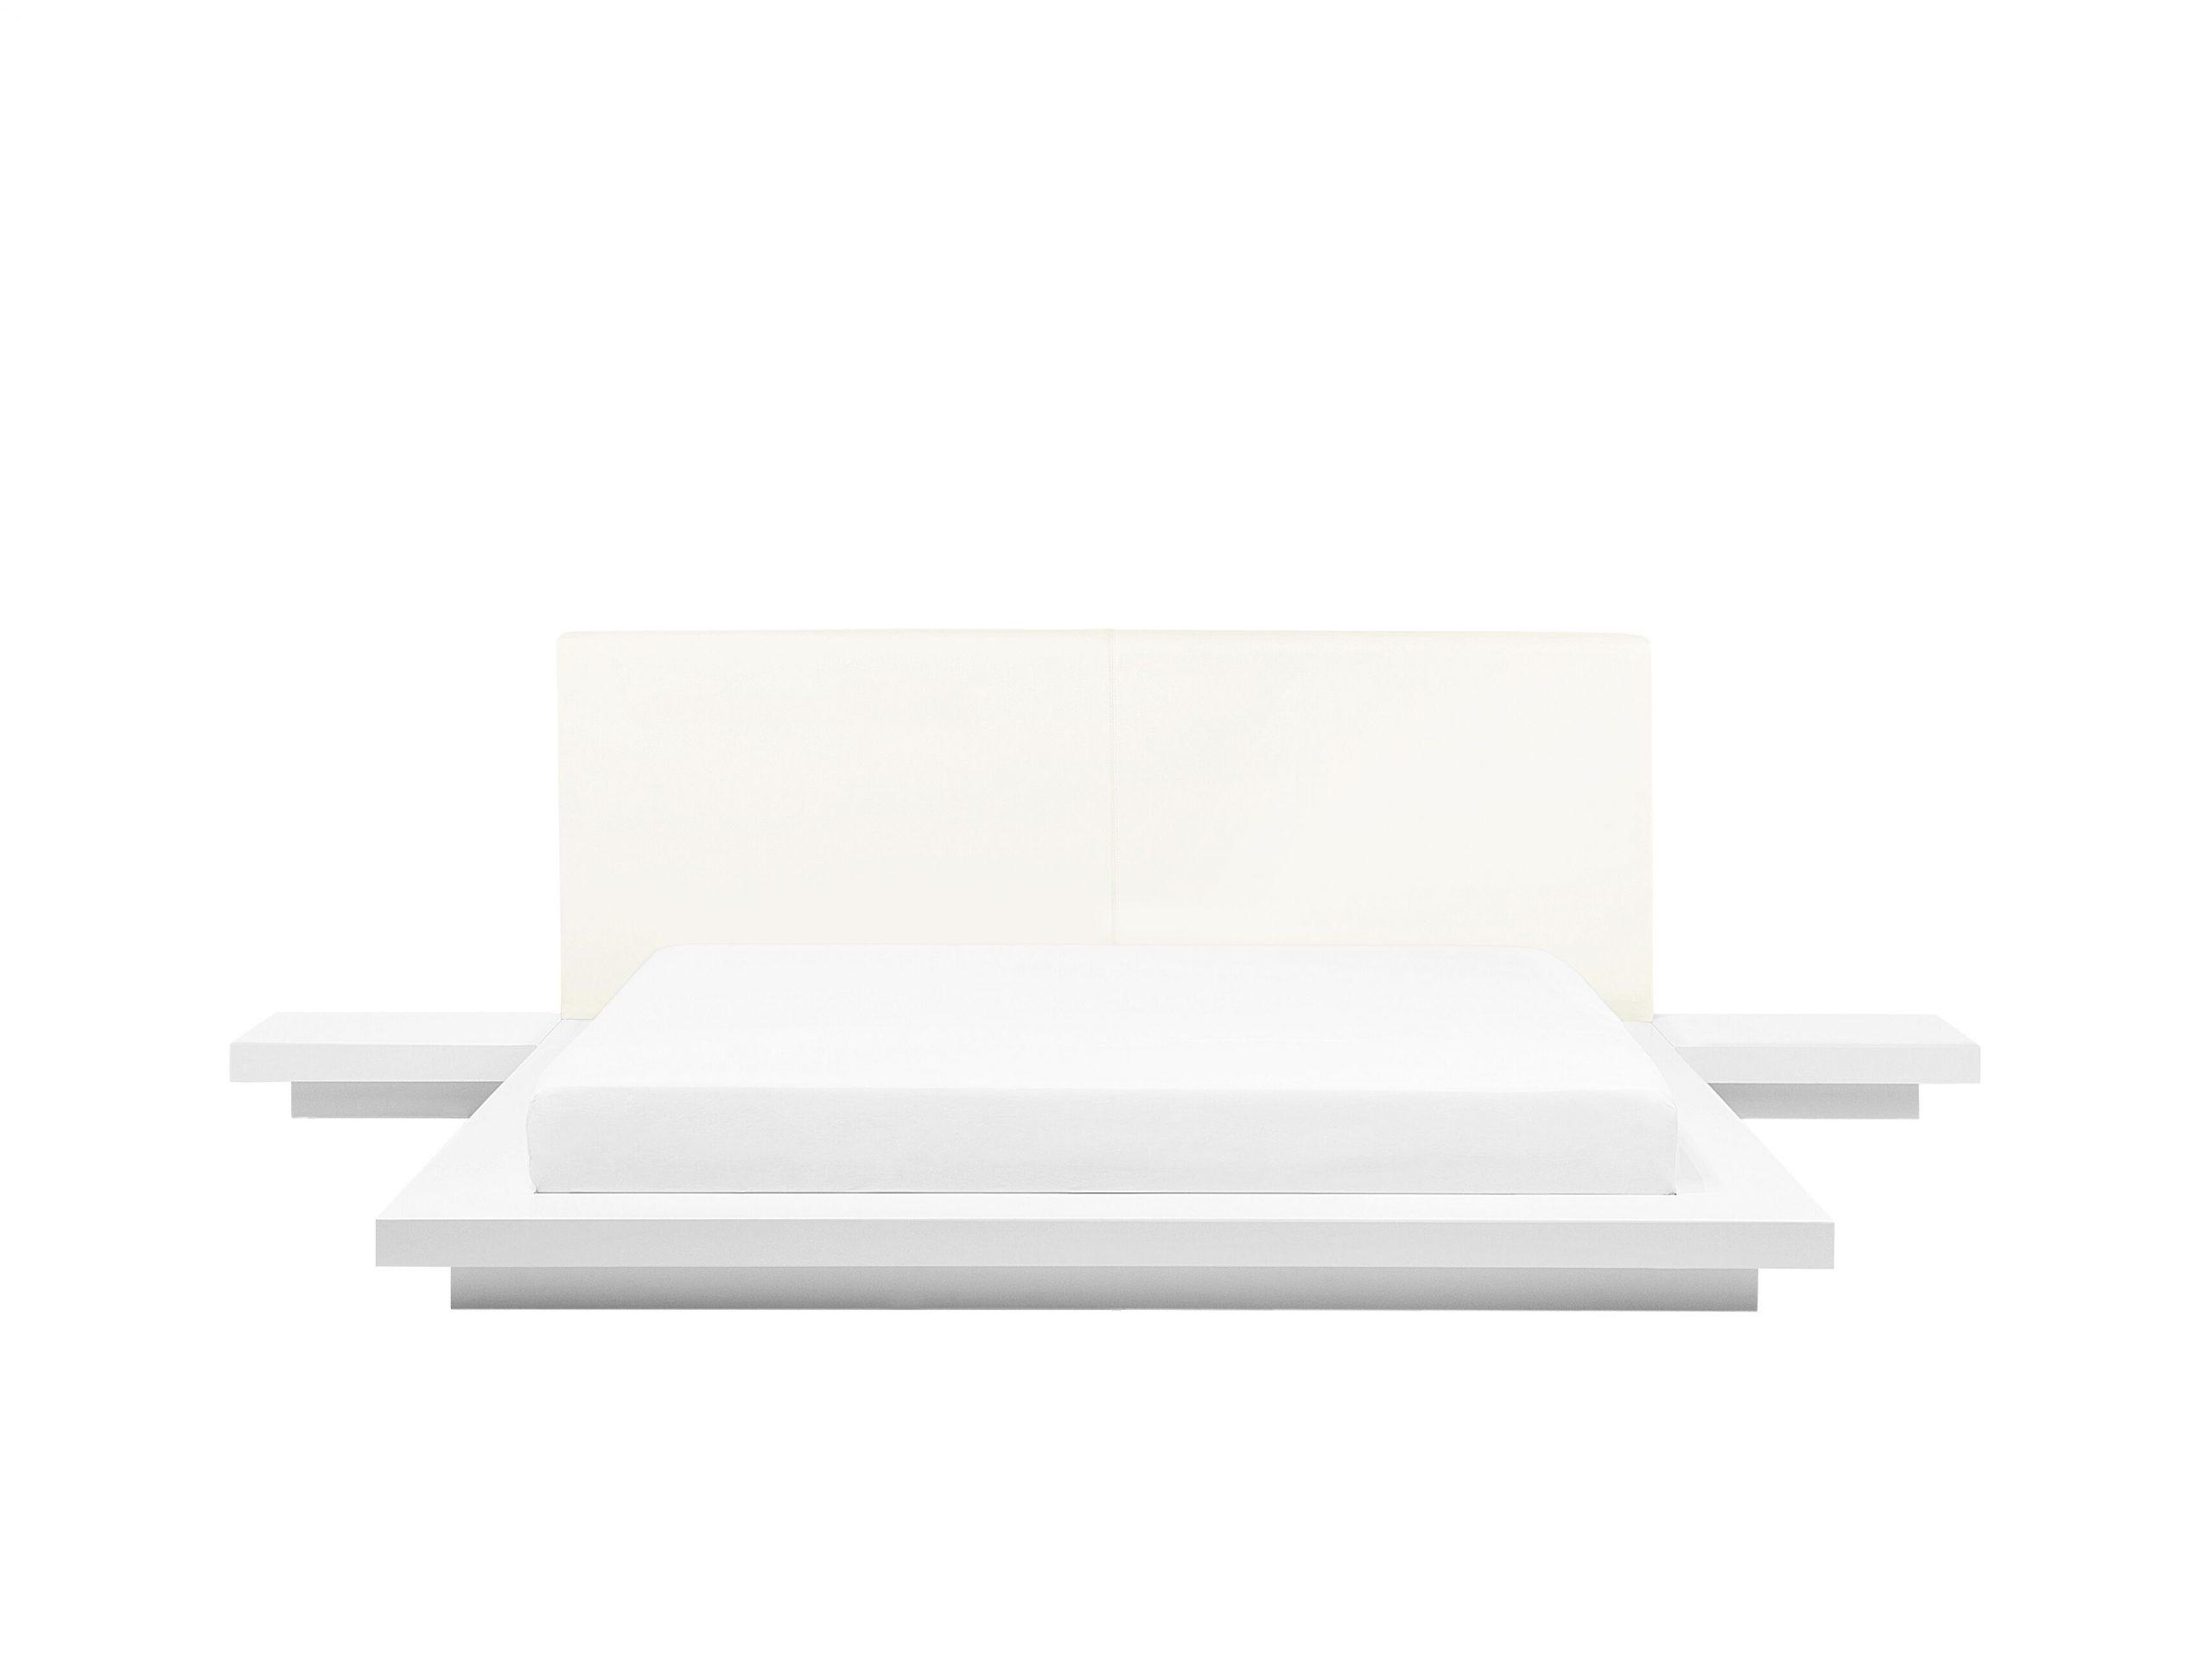 Full Size of Bett 160x200 Mit Lattenrost Wei 160 200 Cm Zen Belianide Sofa Relaxfunktion 3 Sitzer Himmel Betten 140x200 Stabiles Günstige Küche E Geräten Xxl Bock Bett Bett 160x200 Mit Lattenrost